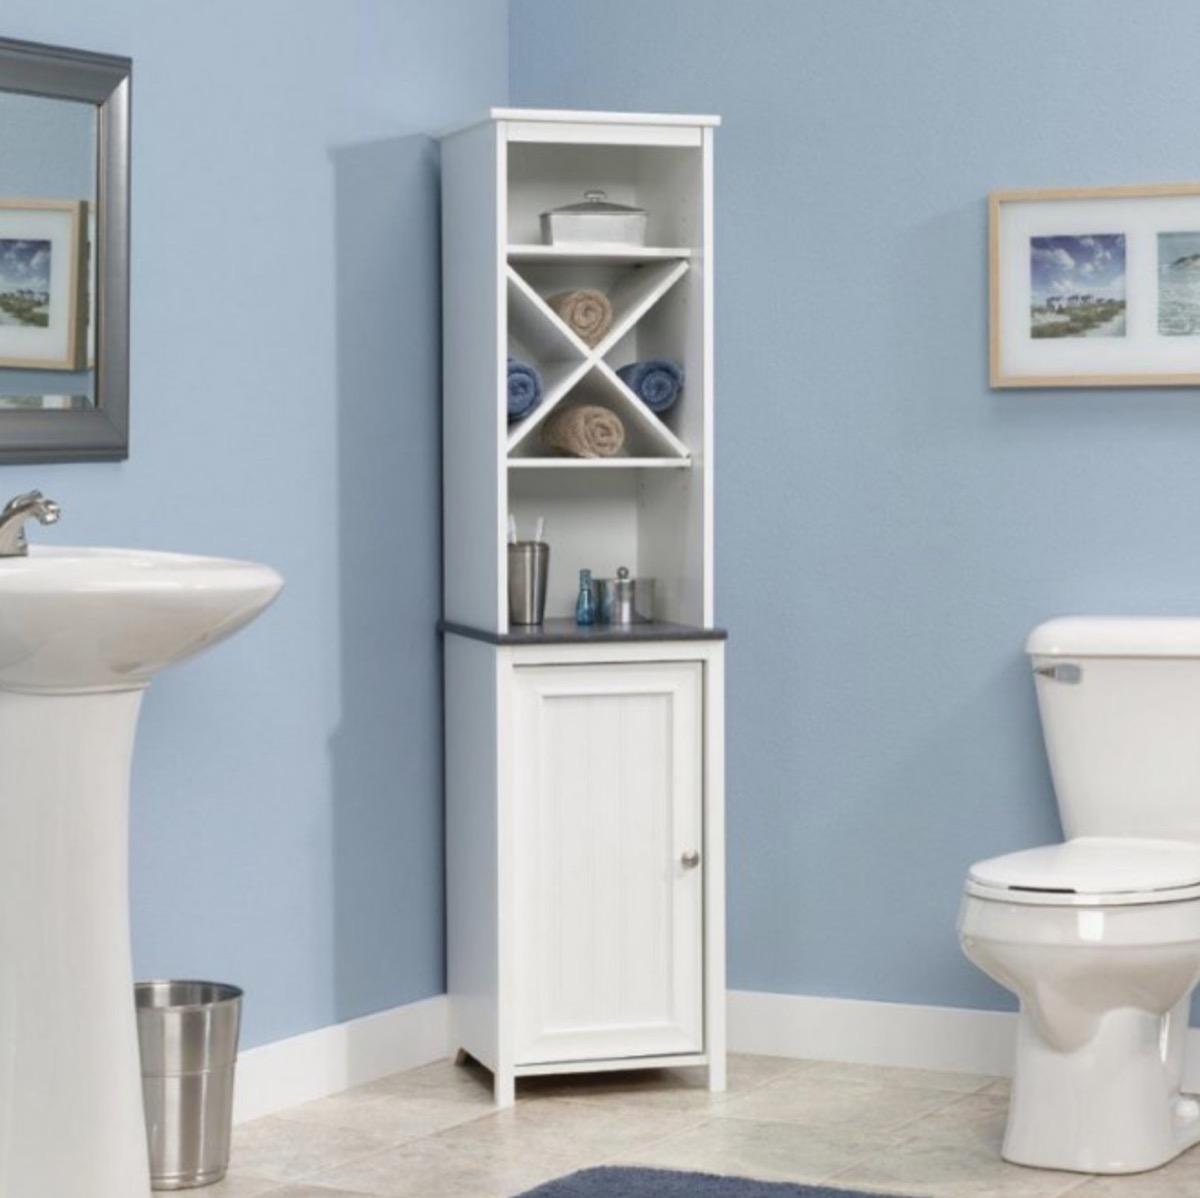 white storage cabinet in blue bathroom, bathroom accessories